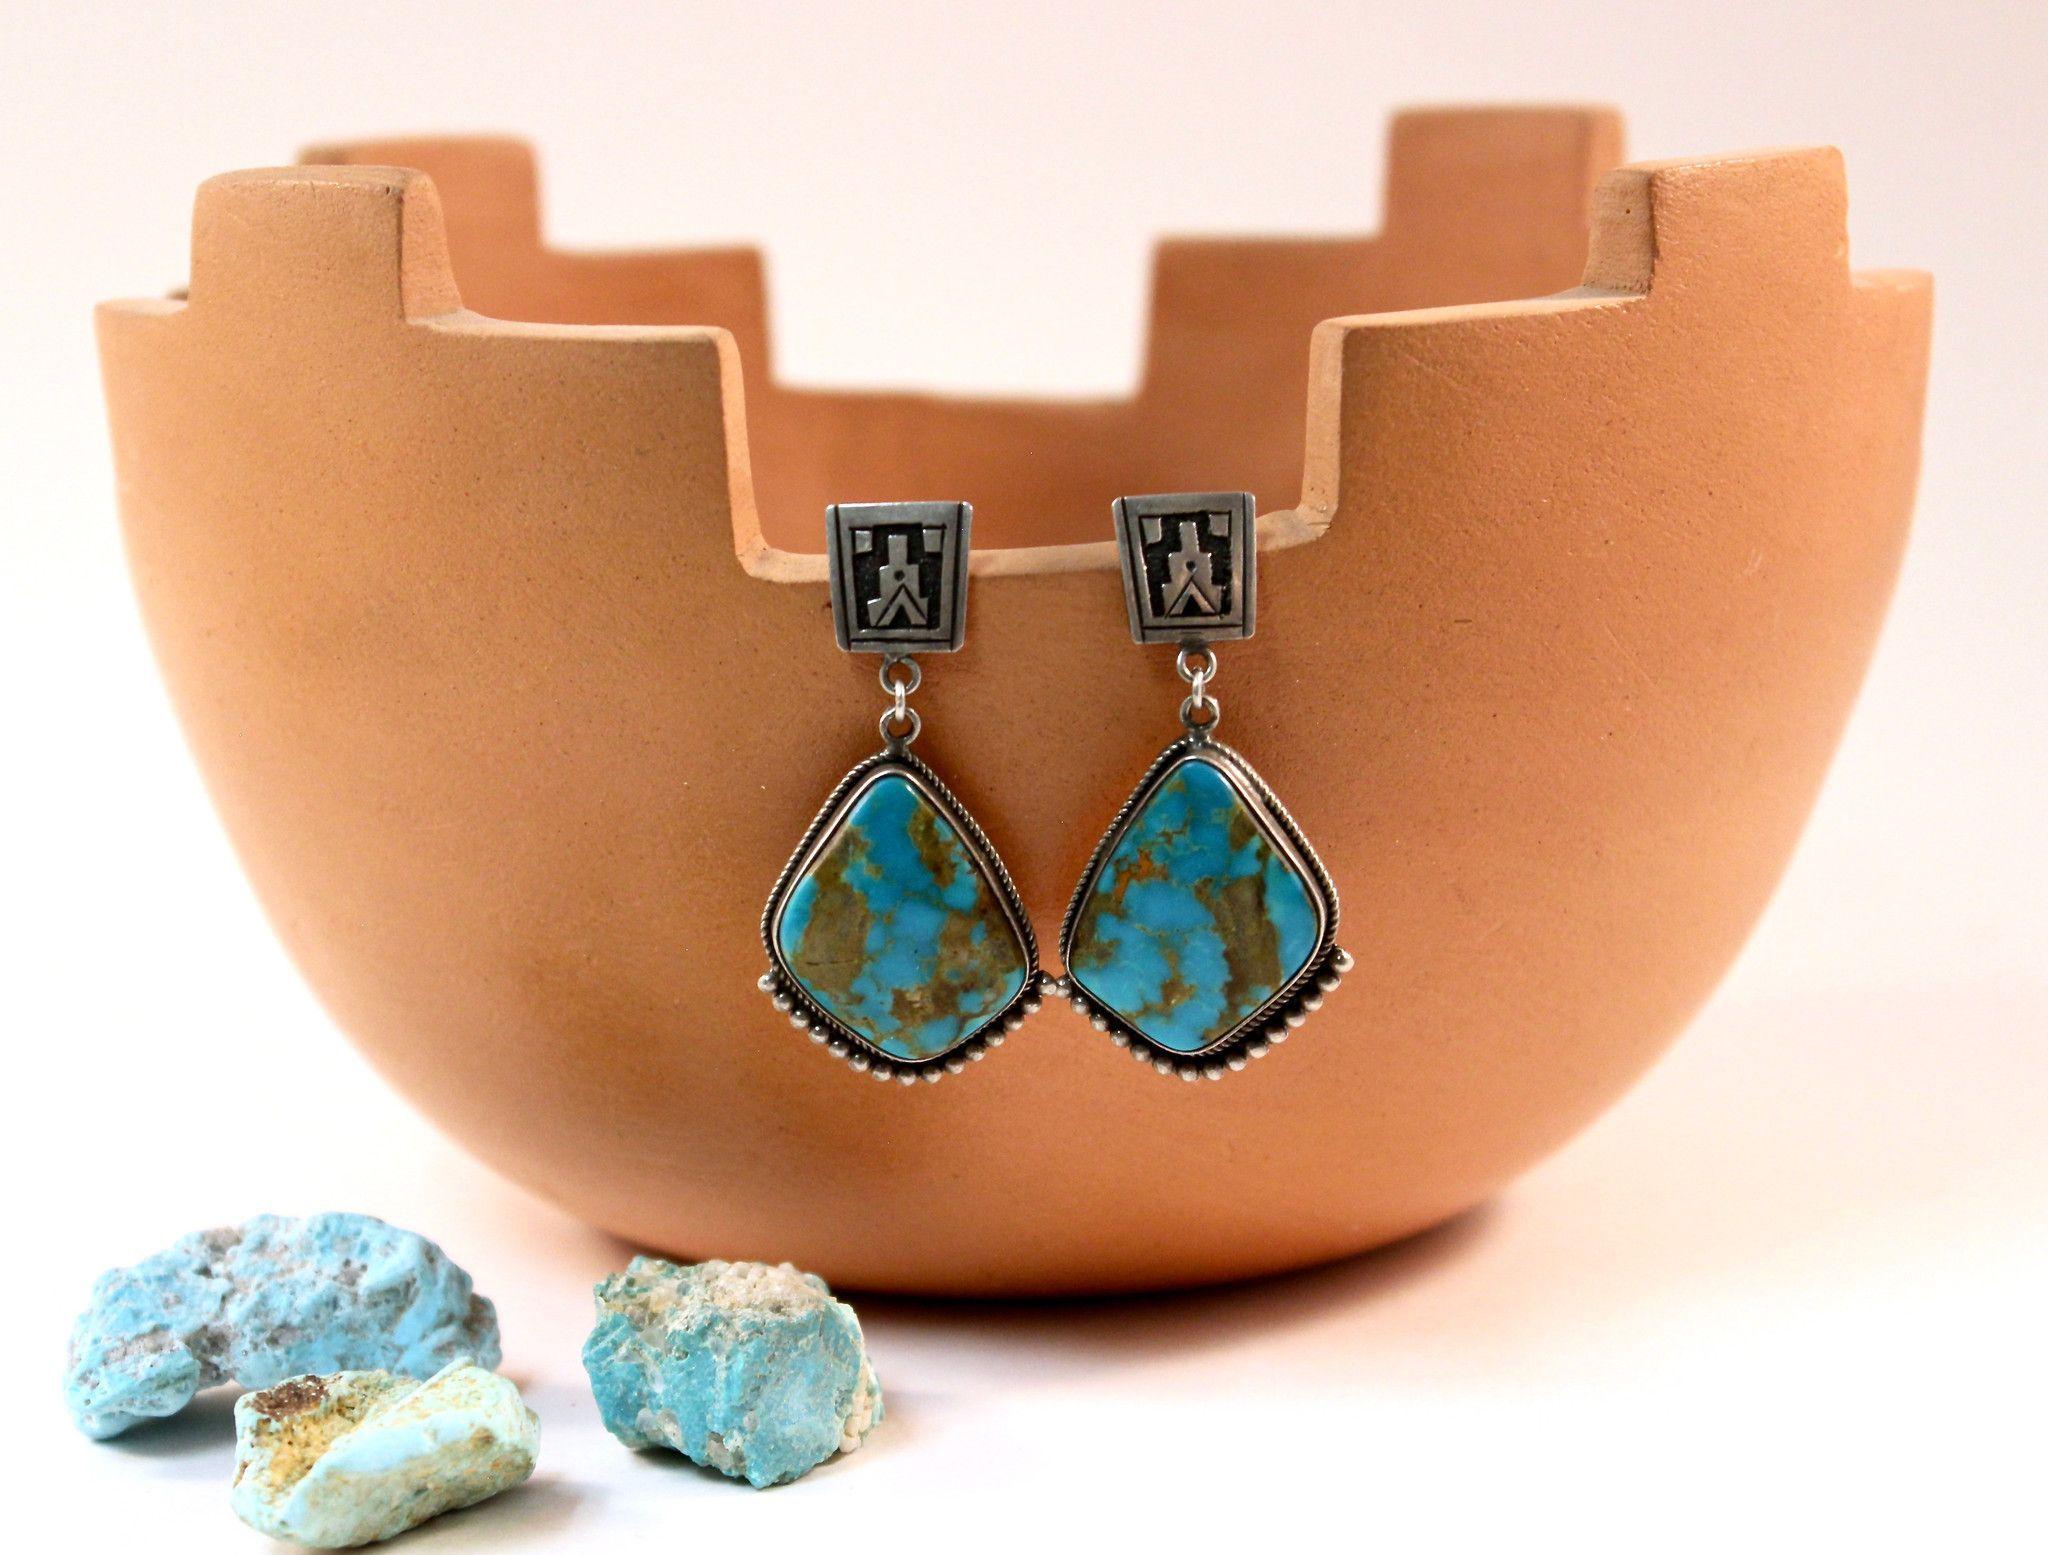 Pueblo Earrings Pilot Mountain Turquoise Sterling Silver Navajo Handmade Gary Nes